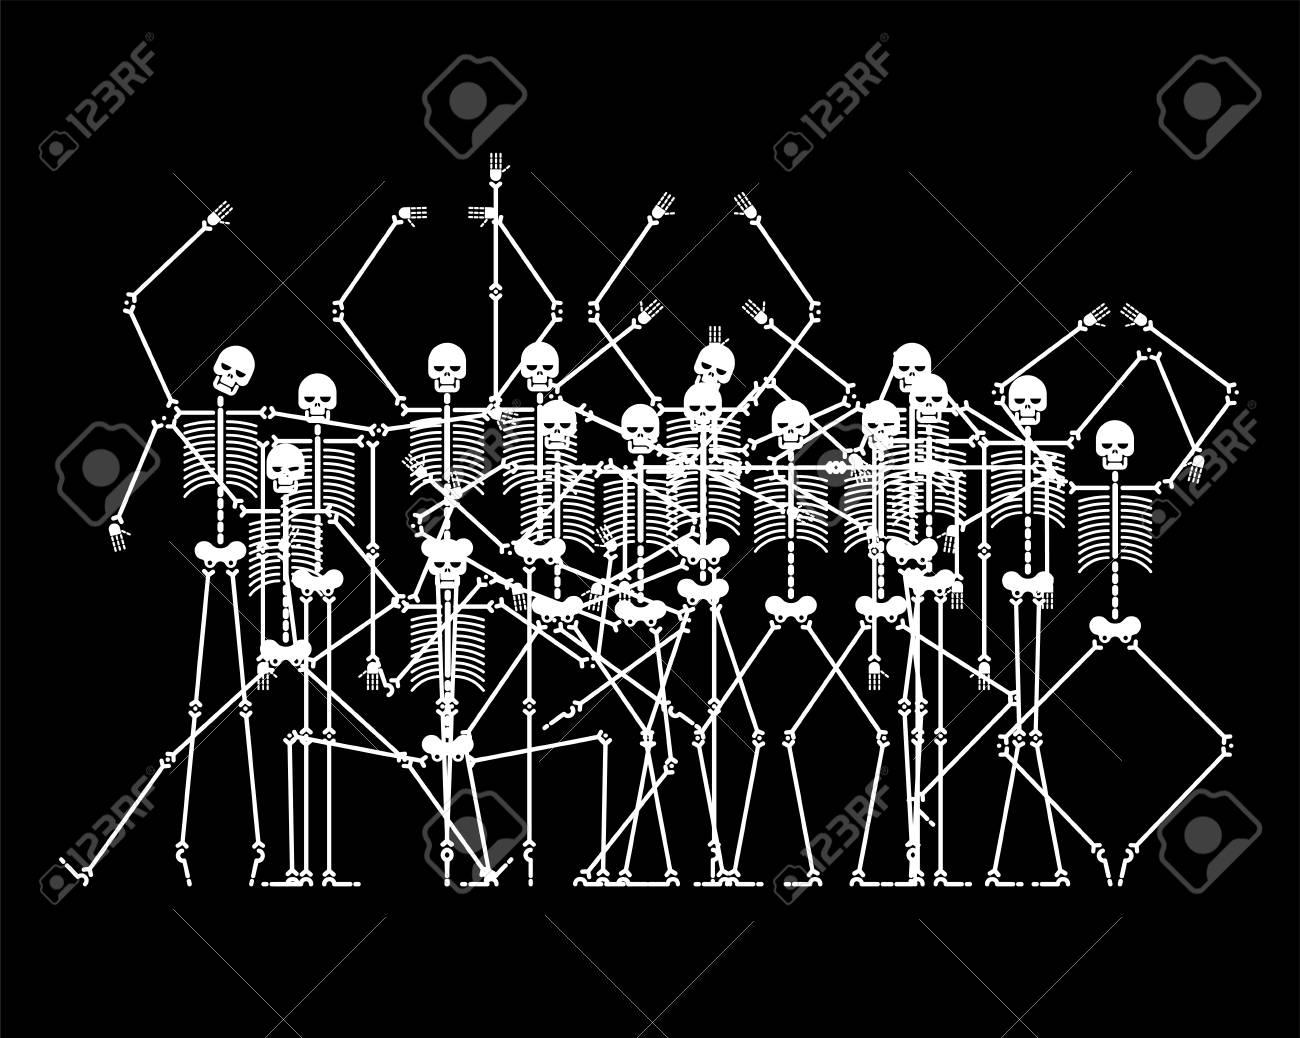 Skeletons in Hell. Sinners skeleton crowd. vector illustration - 107486010